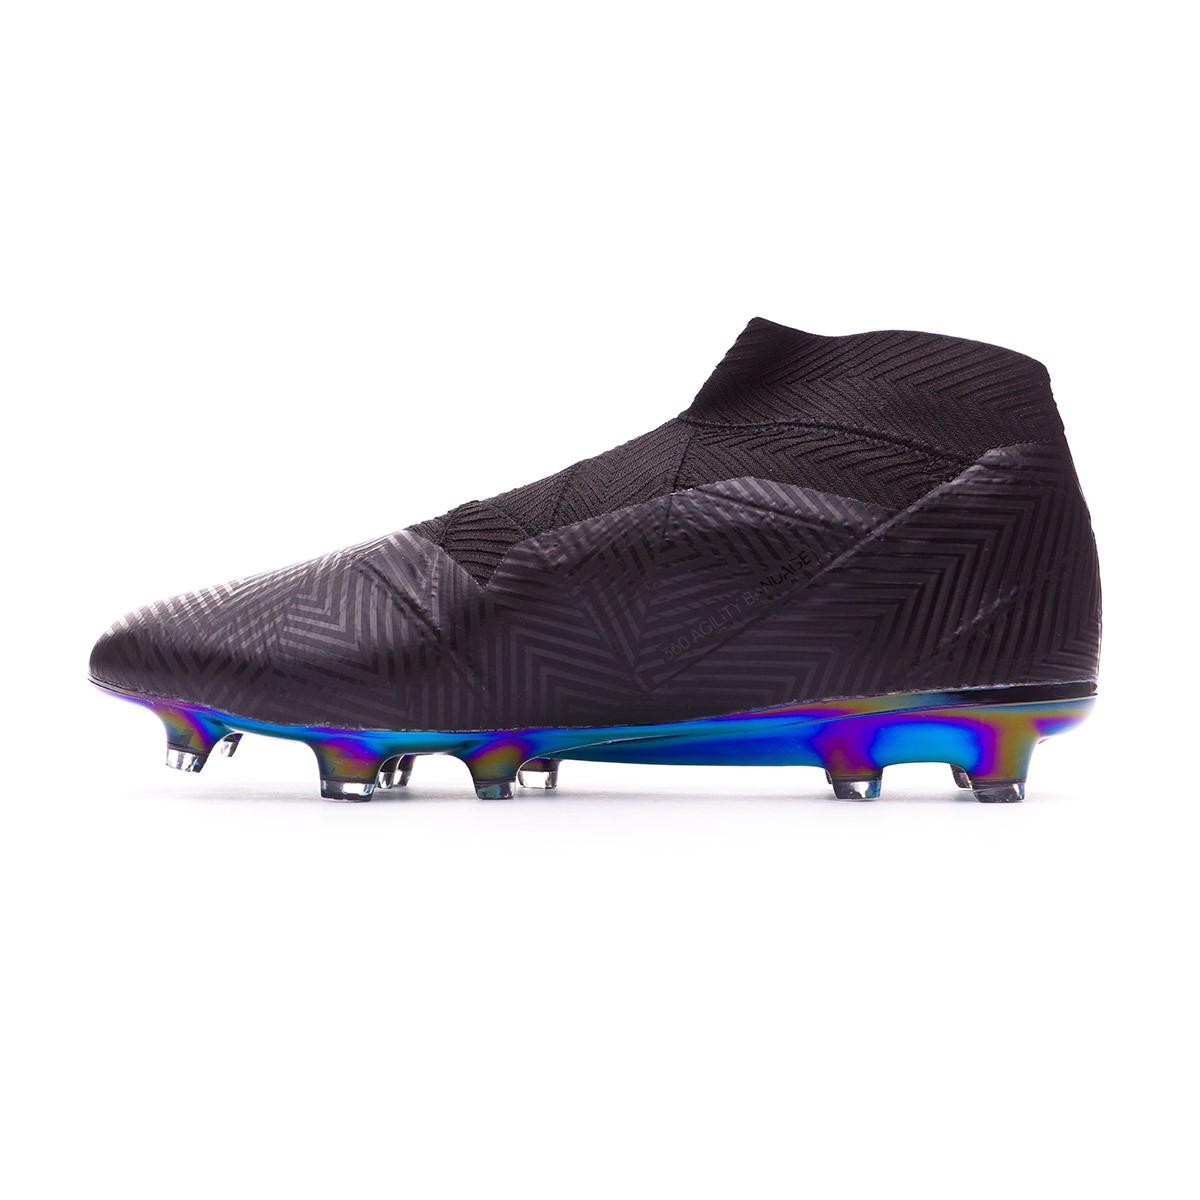 437370897edb Football Boots adidas Nemeziz 18+ FG Core black-White - Tienda de fútbol  Fútbol Emotion